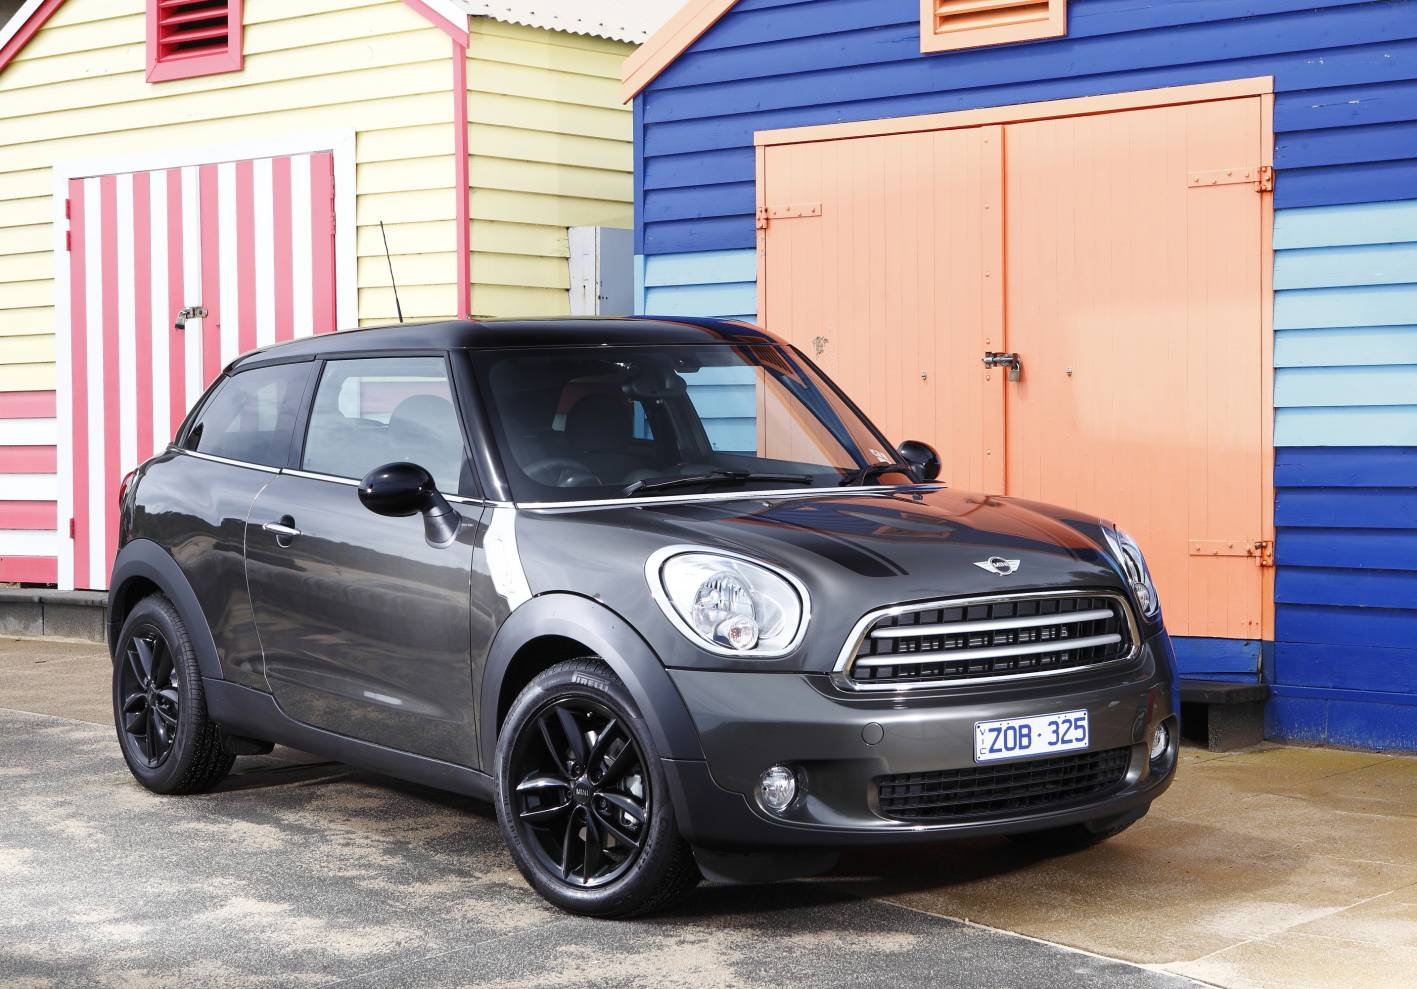 Mini Cooper Convertible Price >> MINI Cars - News: MINI Cooper Paceman